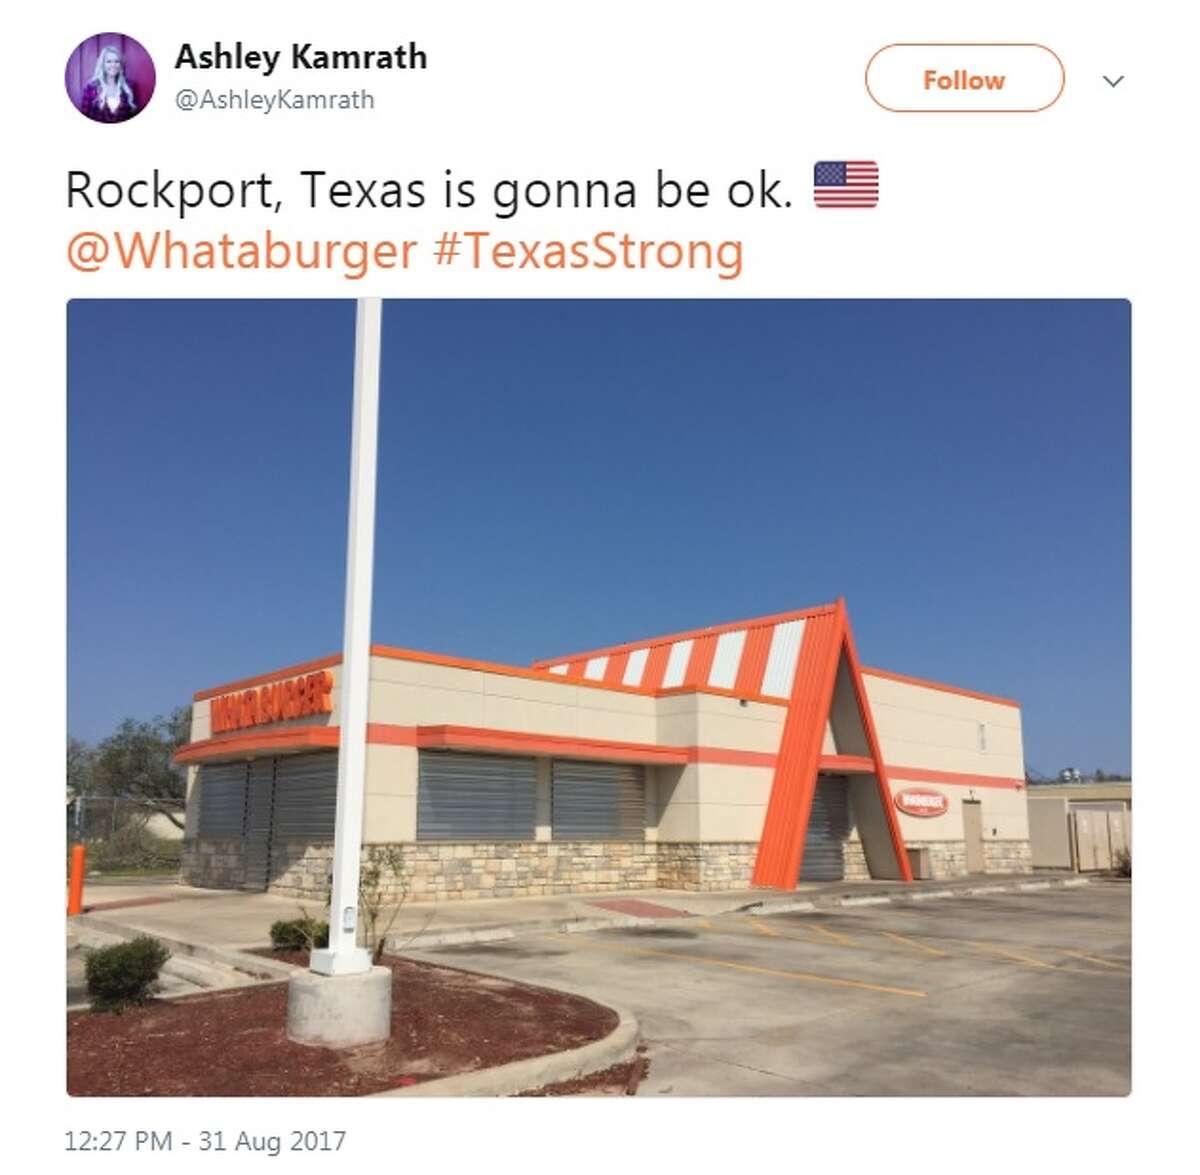 "@AshleyKamrath: ""Rockport, Texas is gonna be ok. @Whataburger #TexasStrong"""